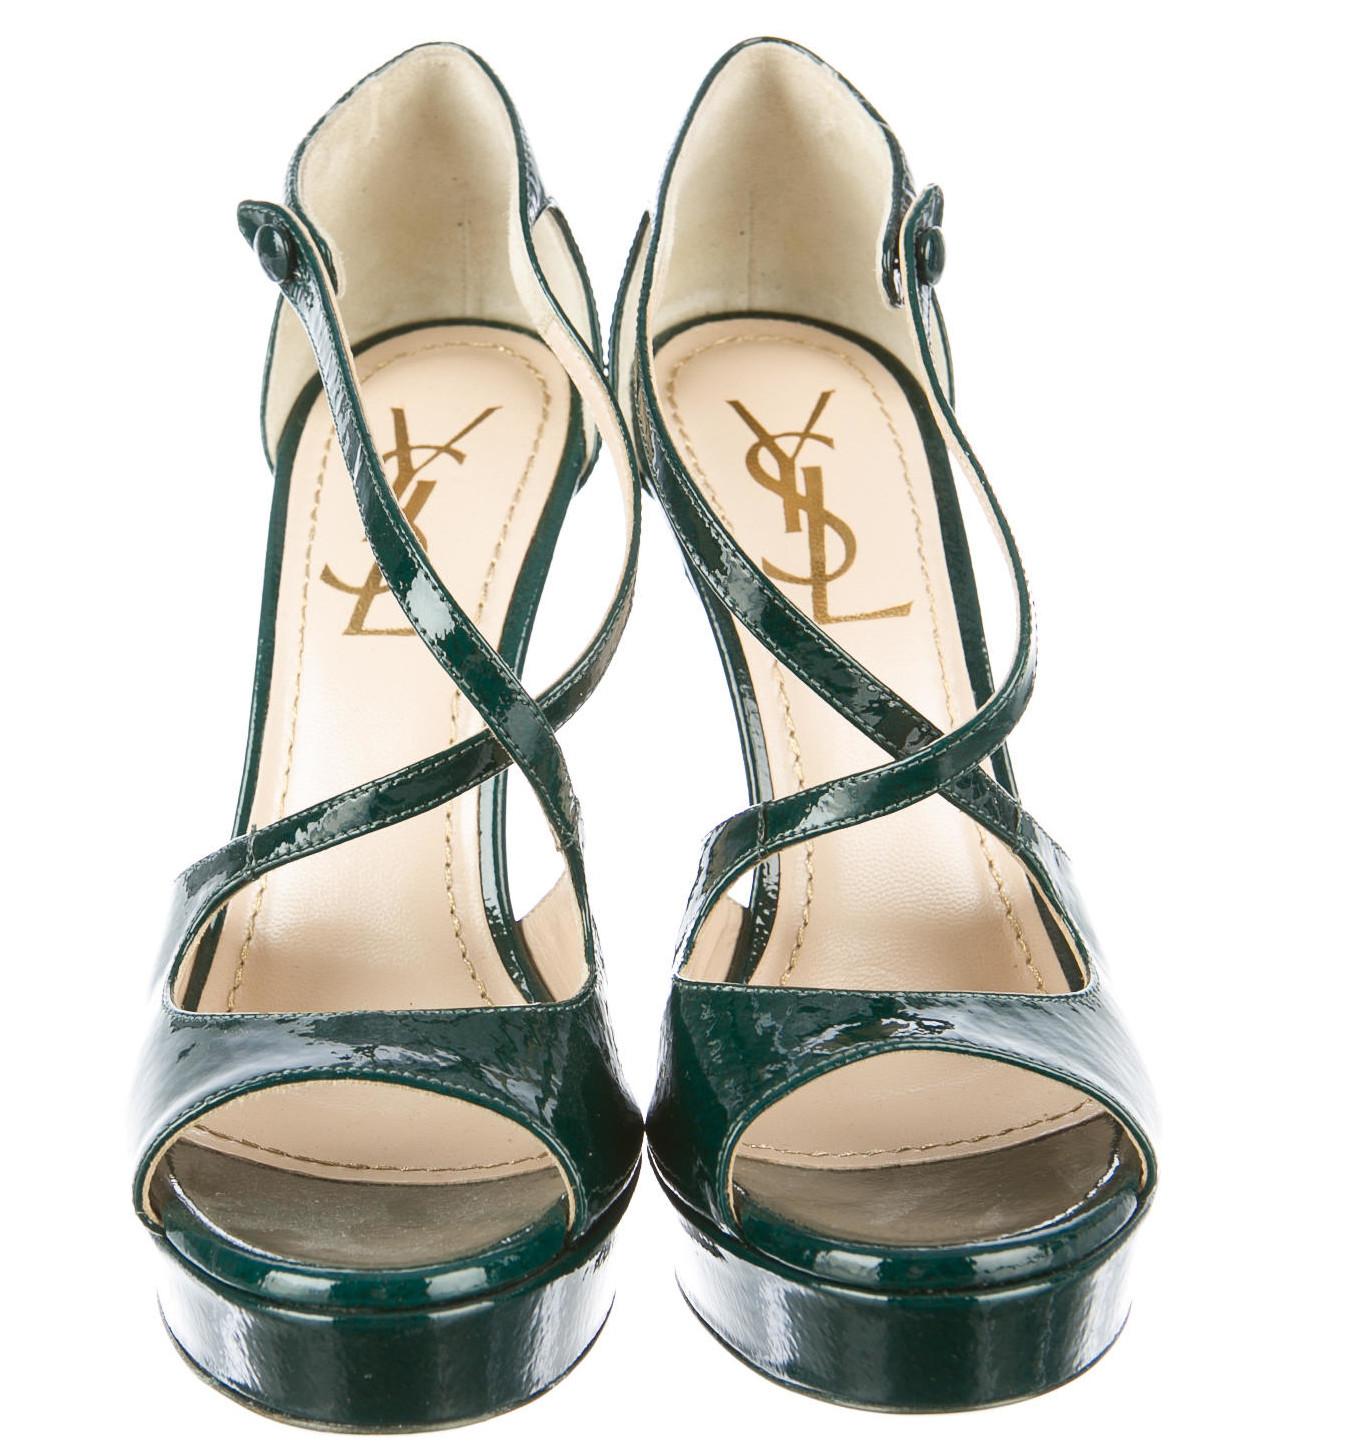 Teal green Yves Saint Laurent patent leather platform sandals